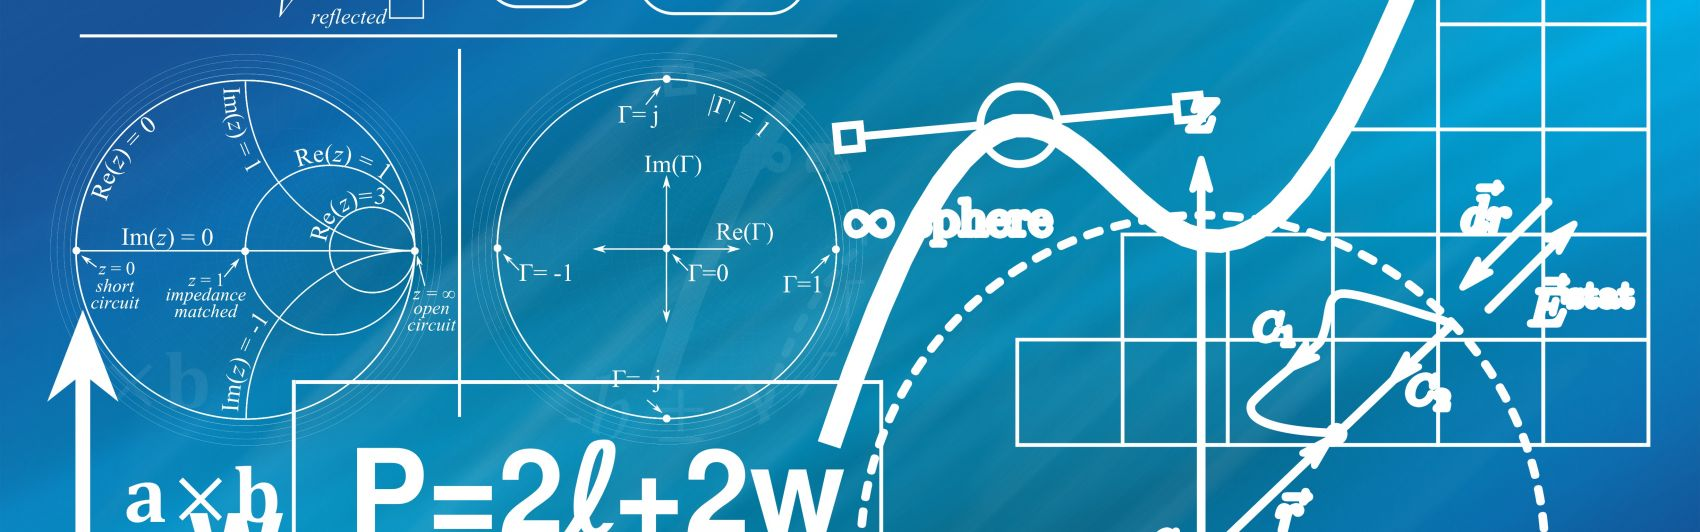 Schul-Mathematik